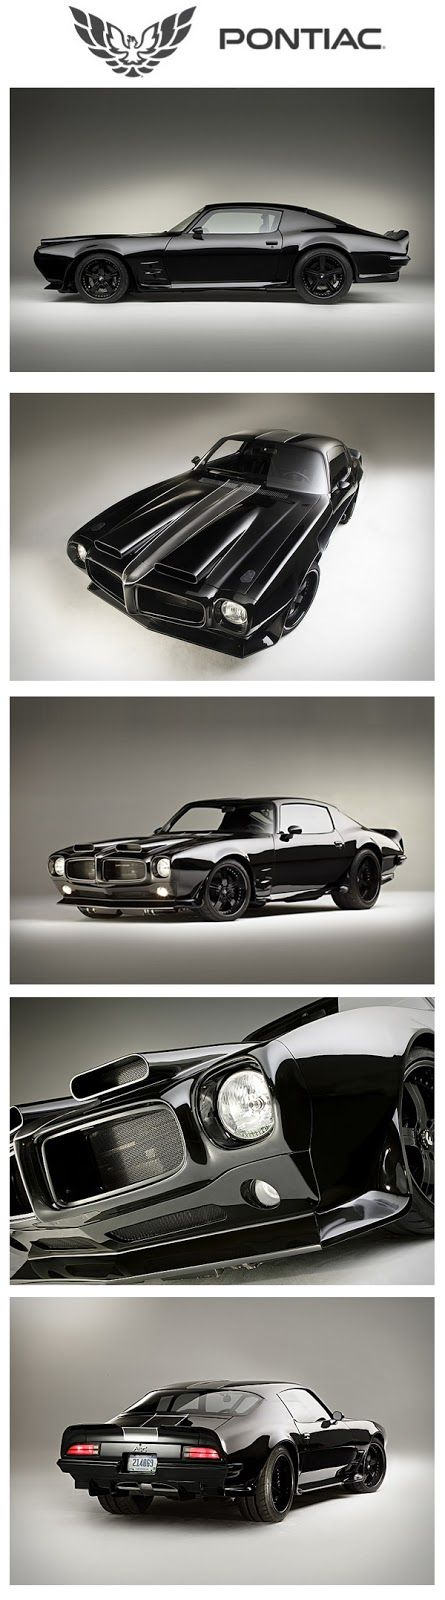 '70 Pontiac Firebird